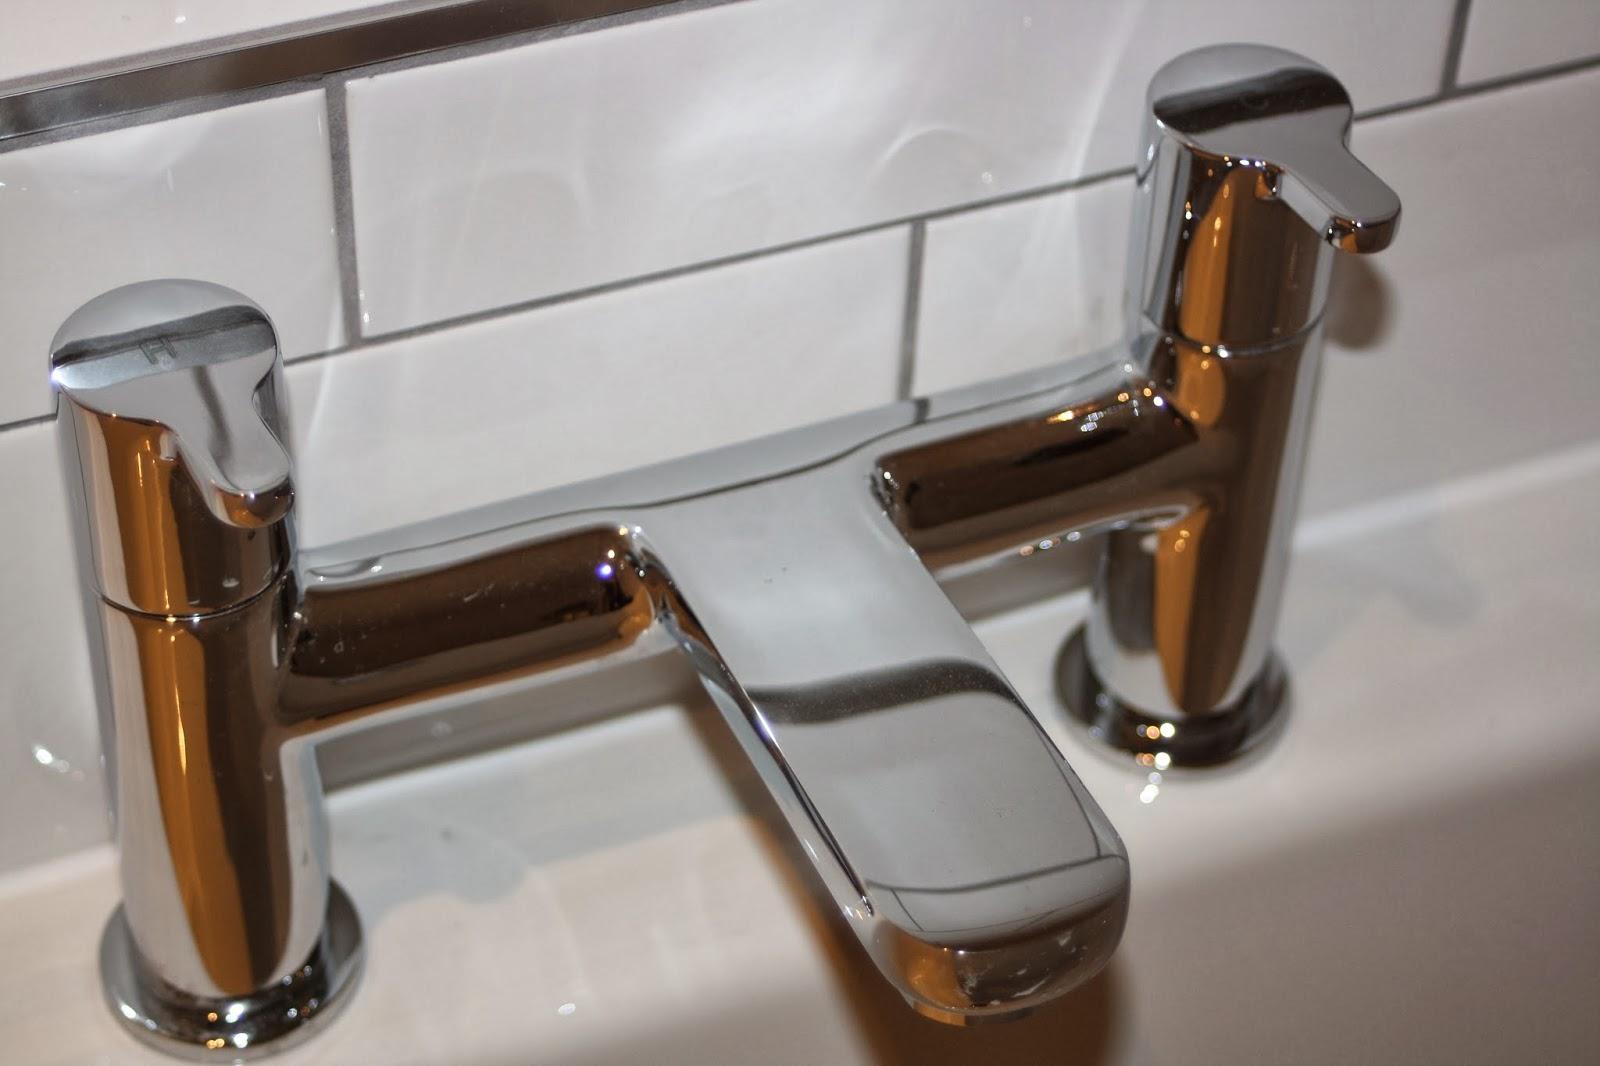 Bath-taps-new-house-365